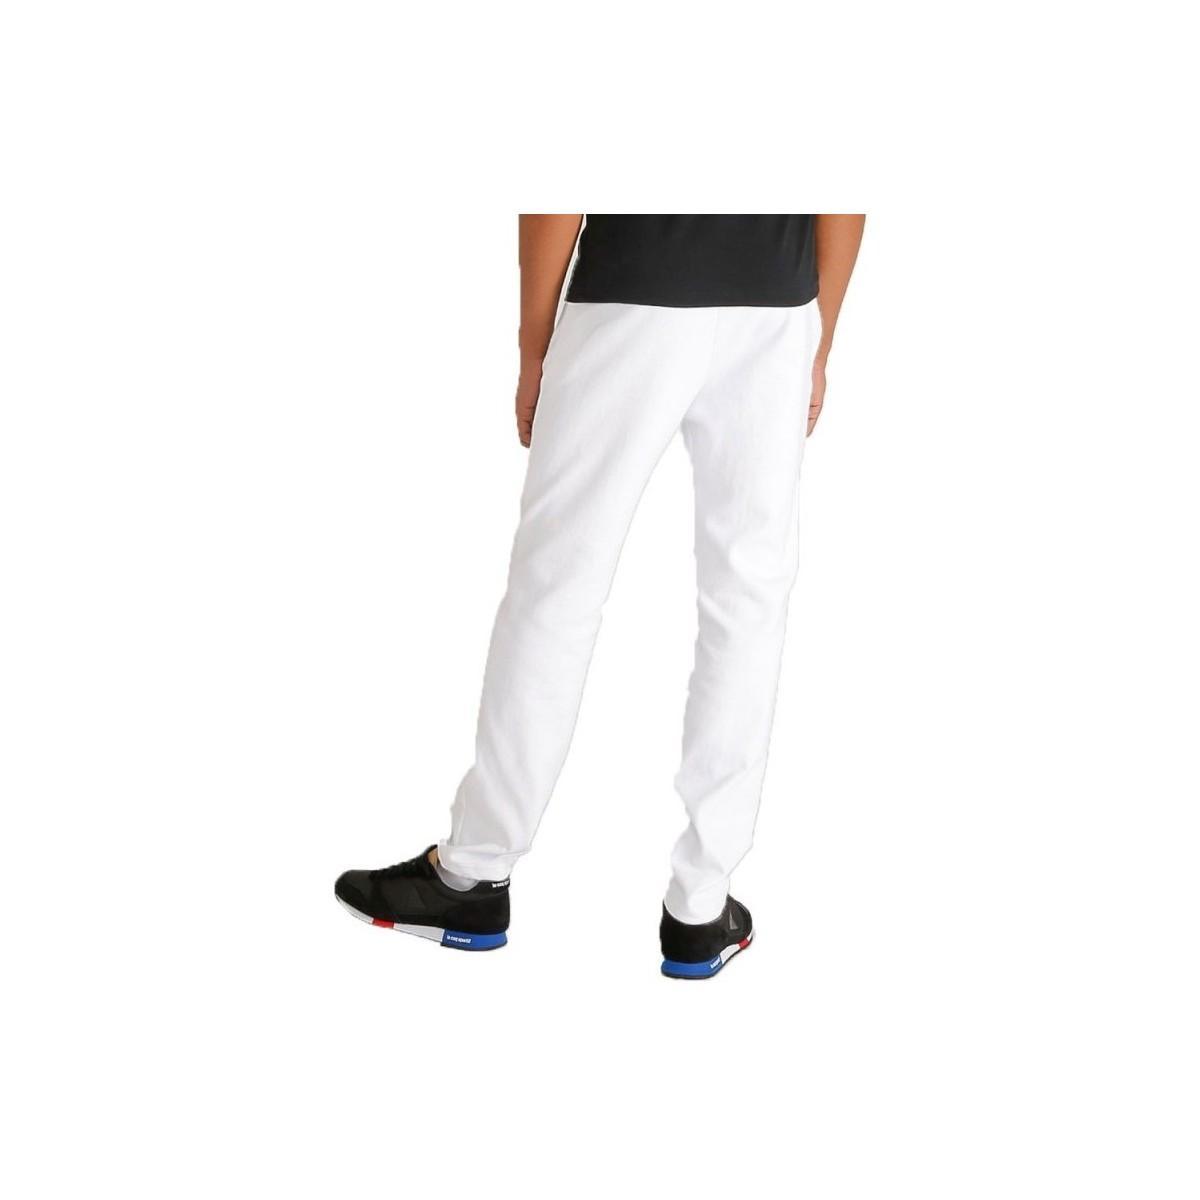 1910372 Jogging Le Coq Sportif en coloris Blanc